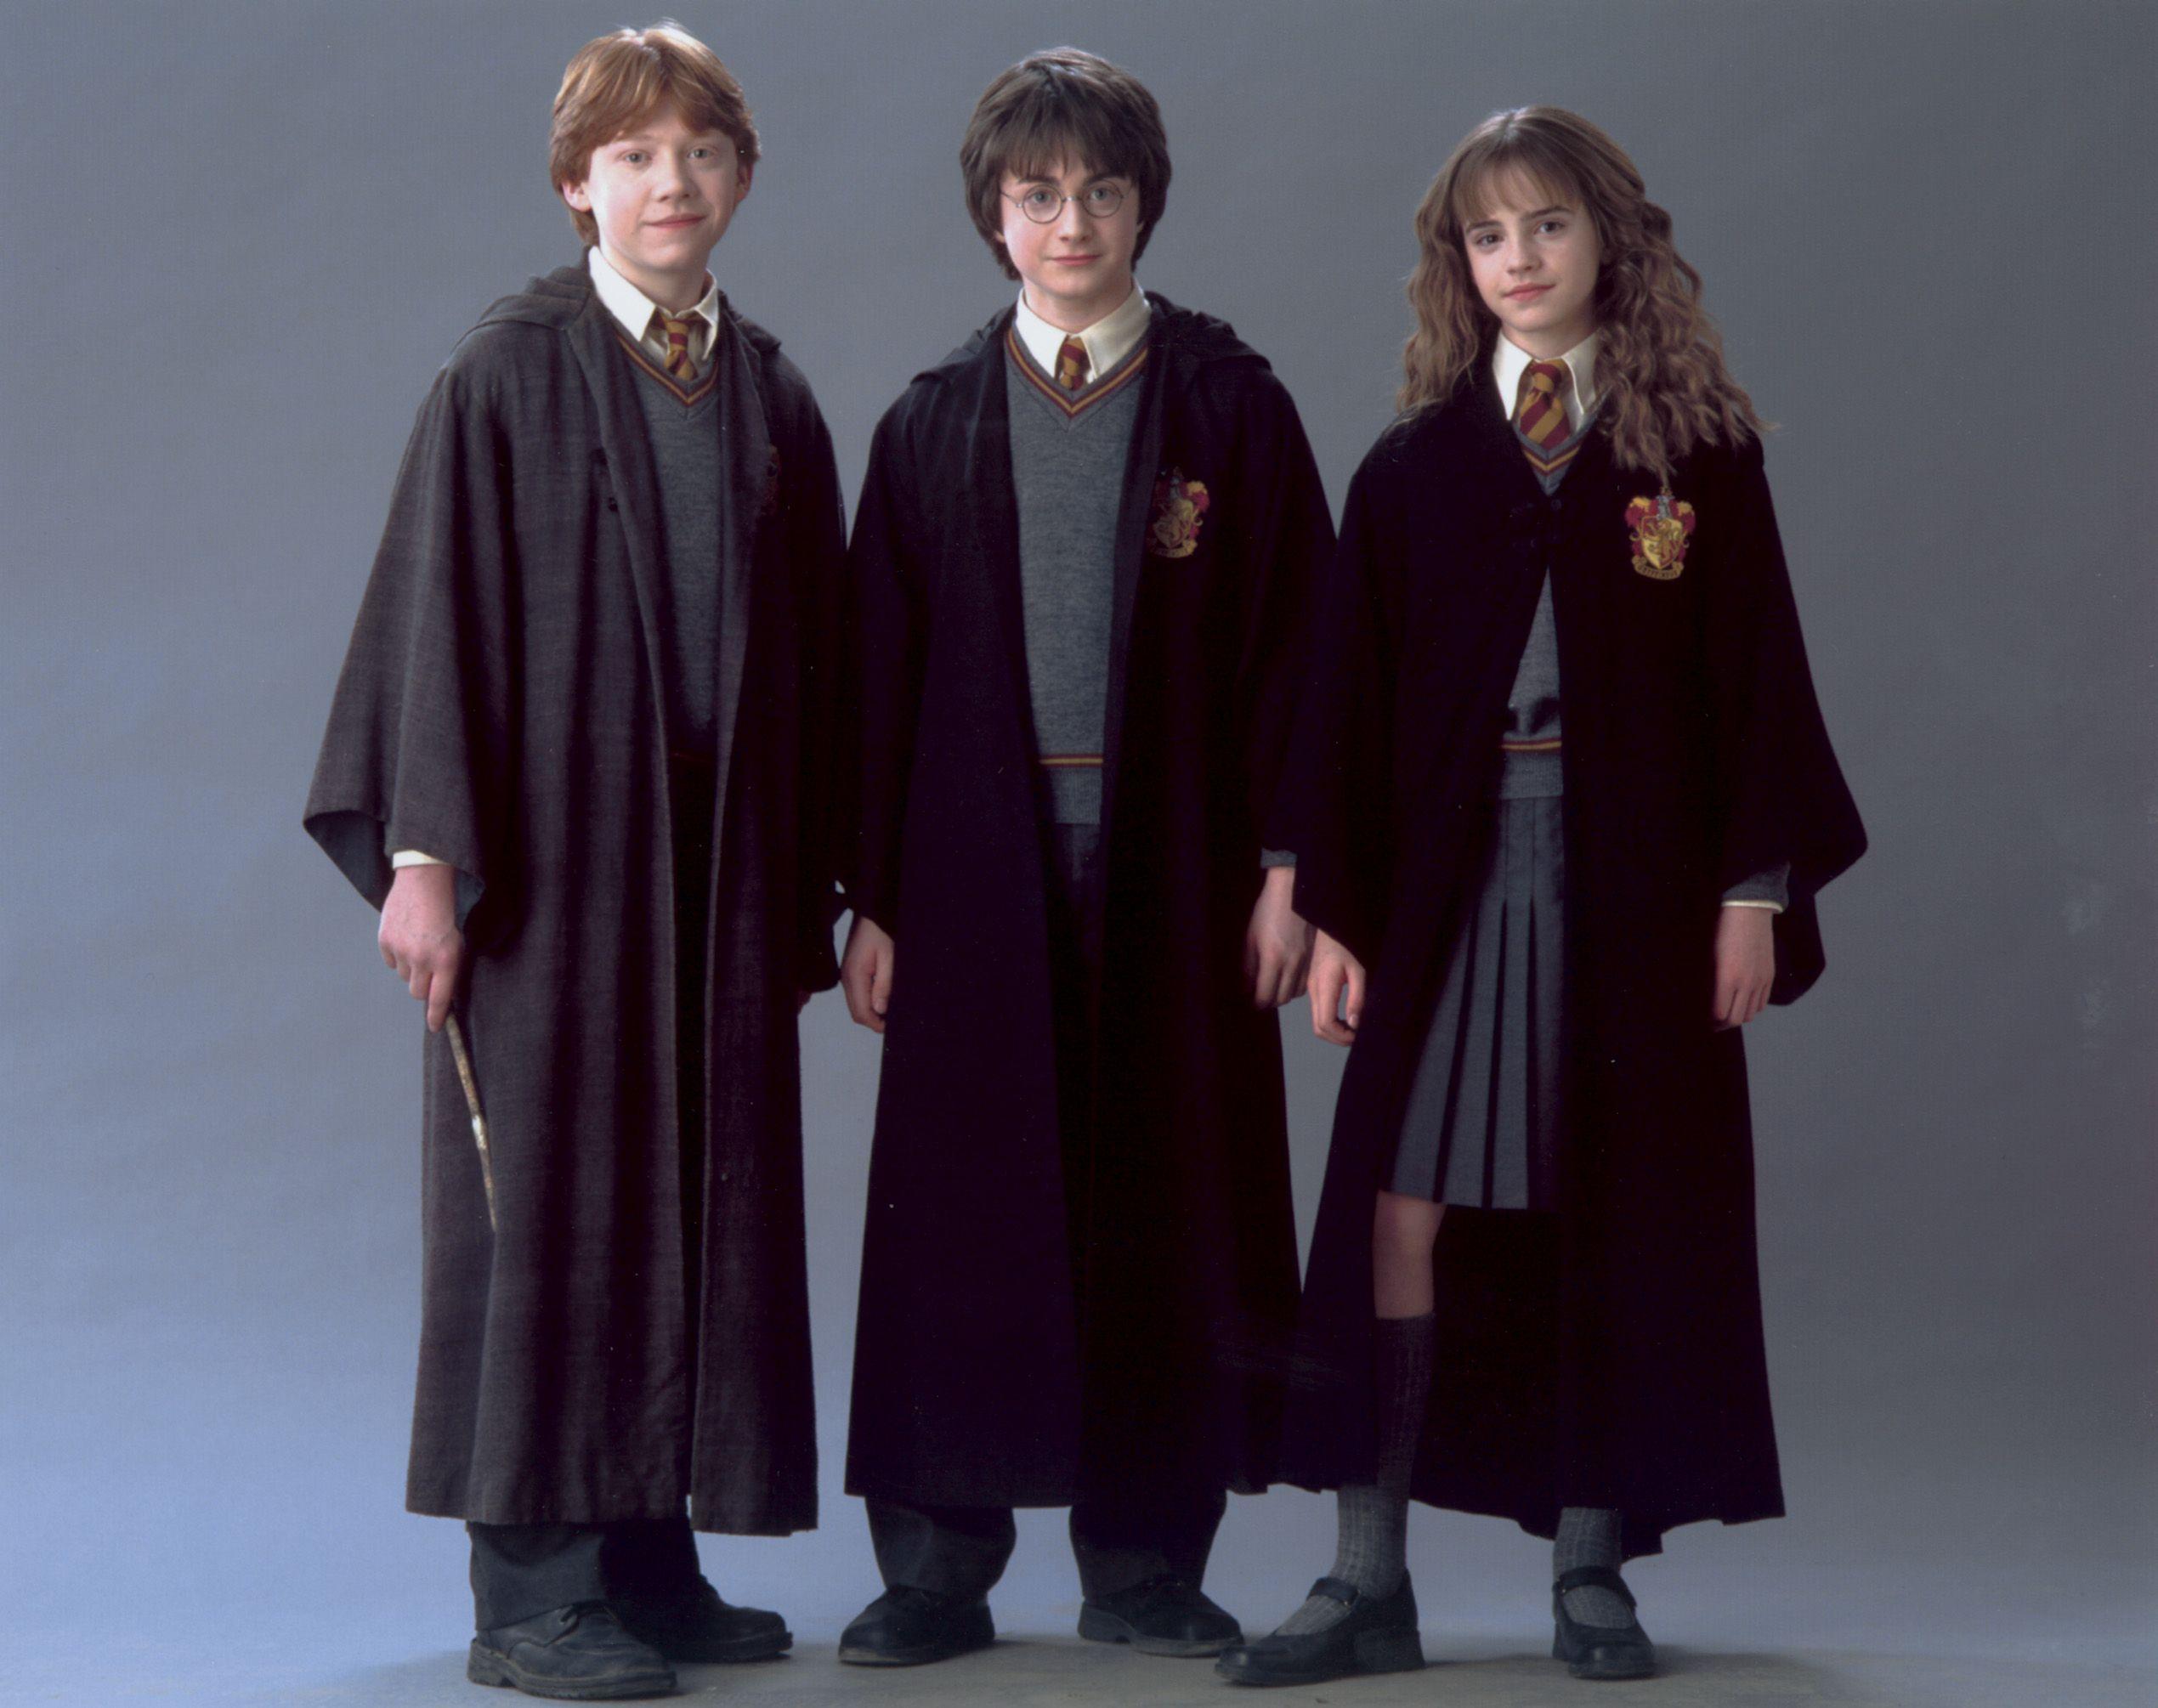 HP - Harry Potter Photo (32704542) - Fanpop